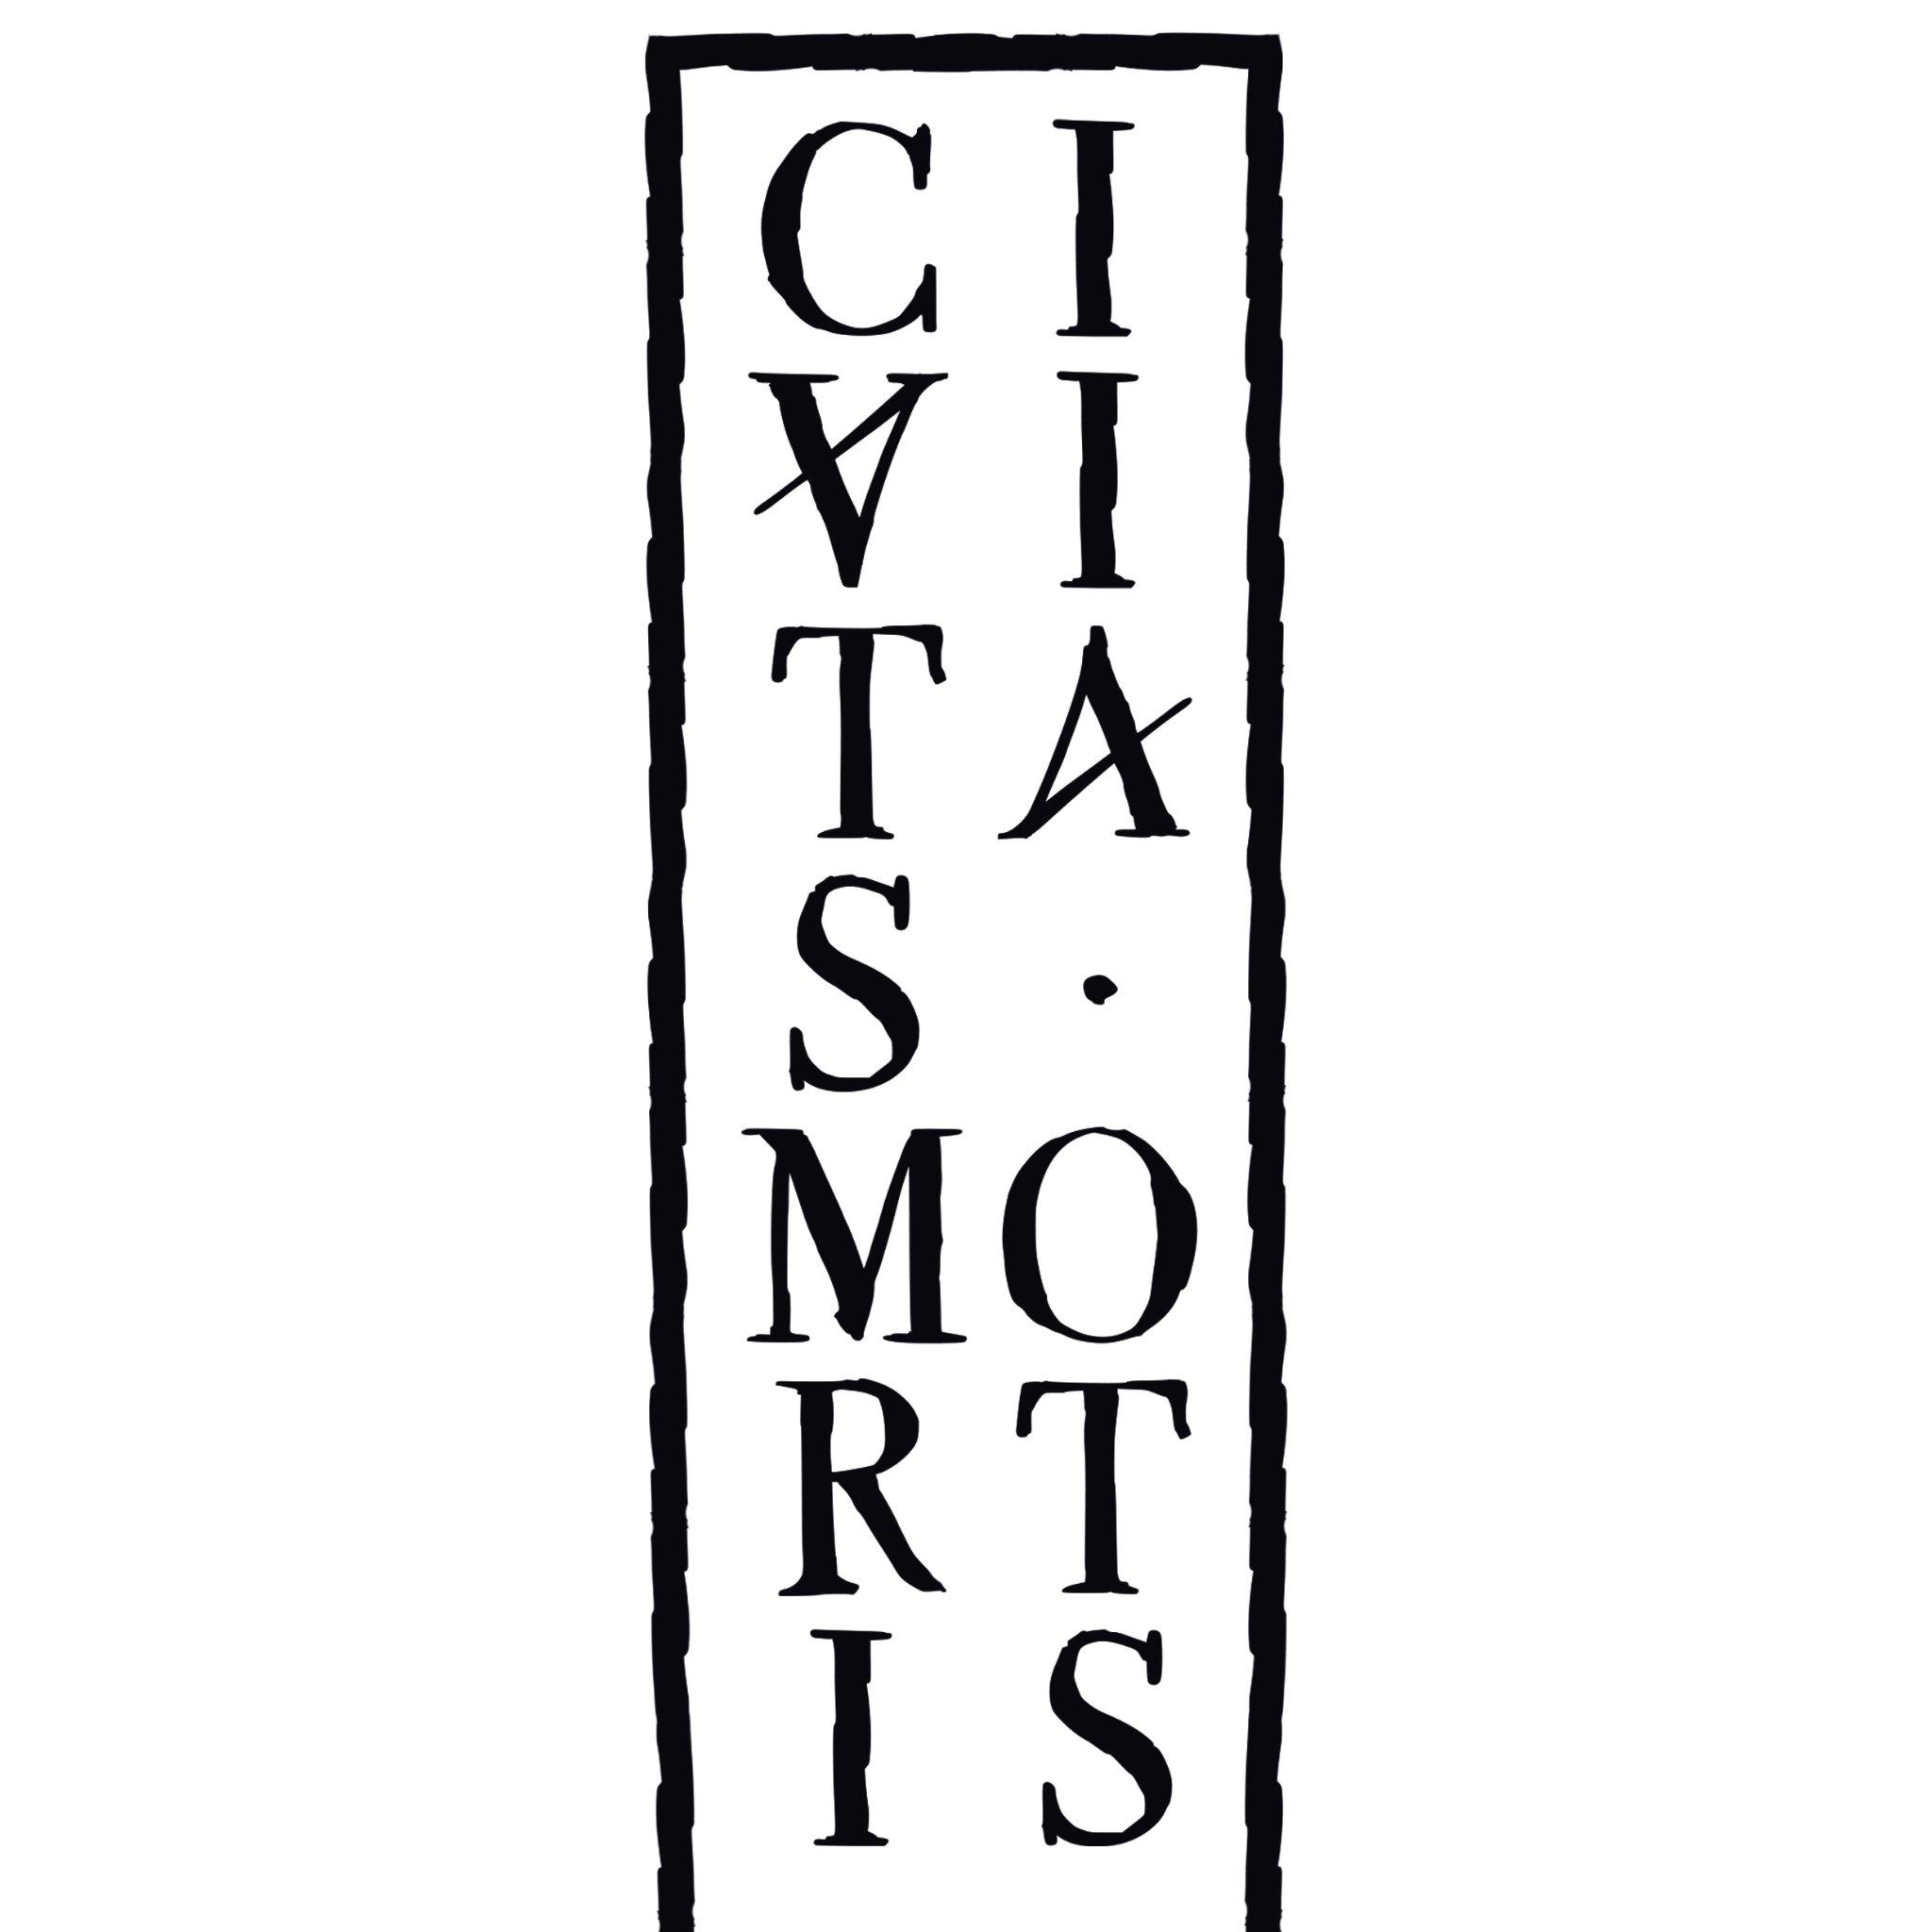 Civitas Mortis